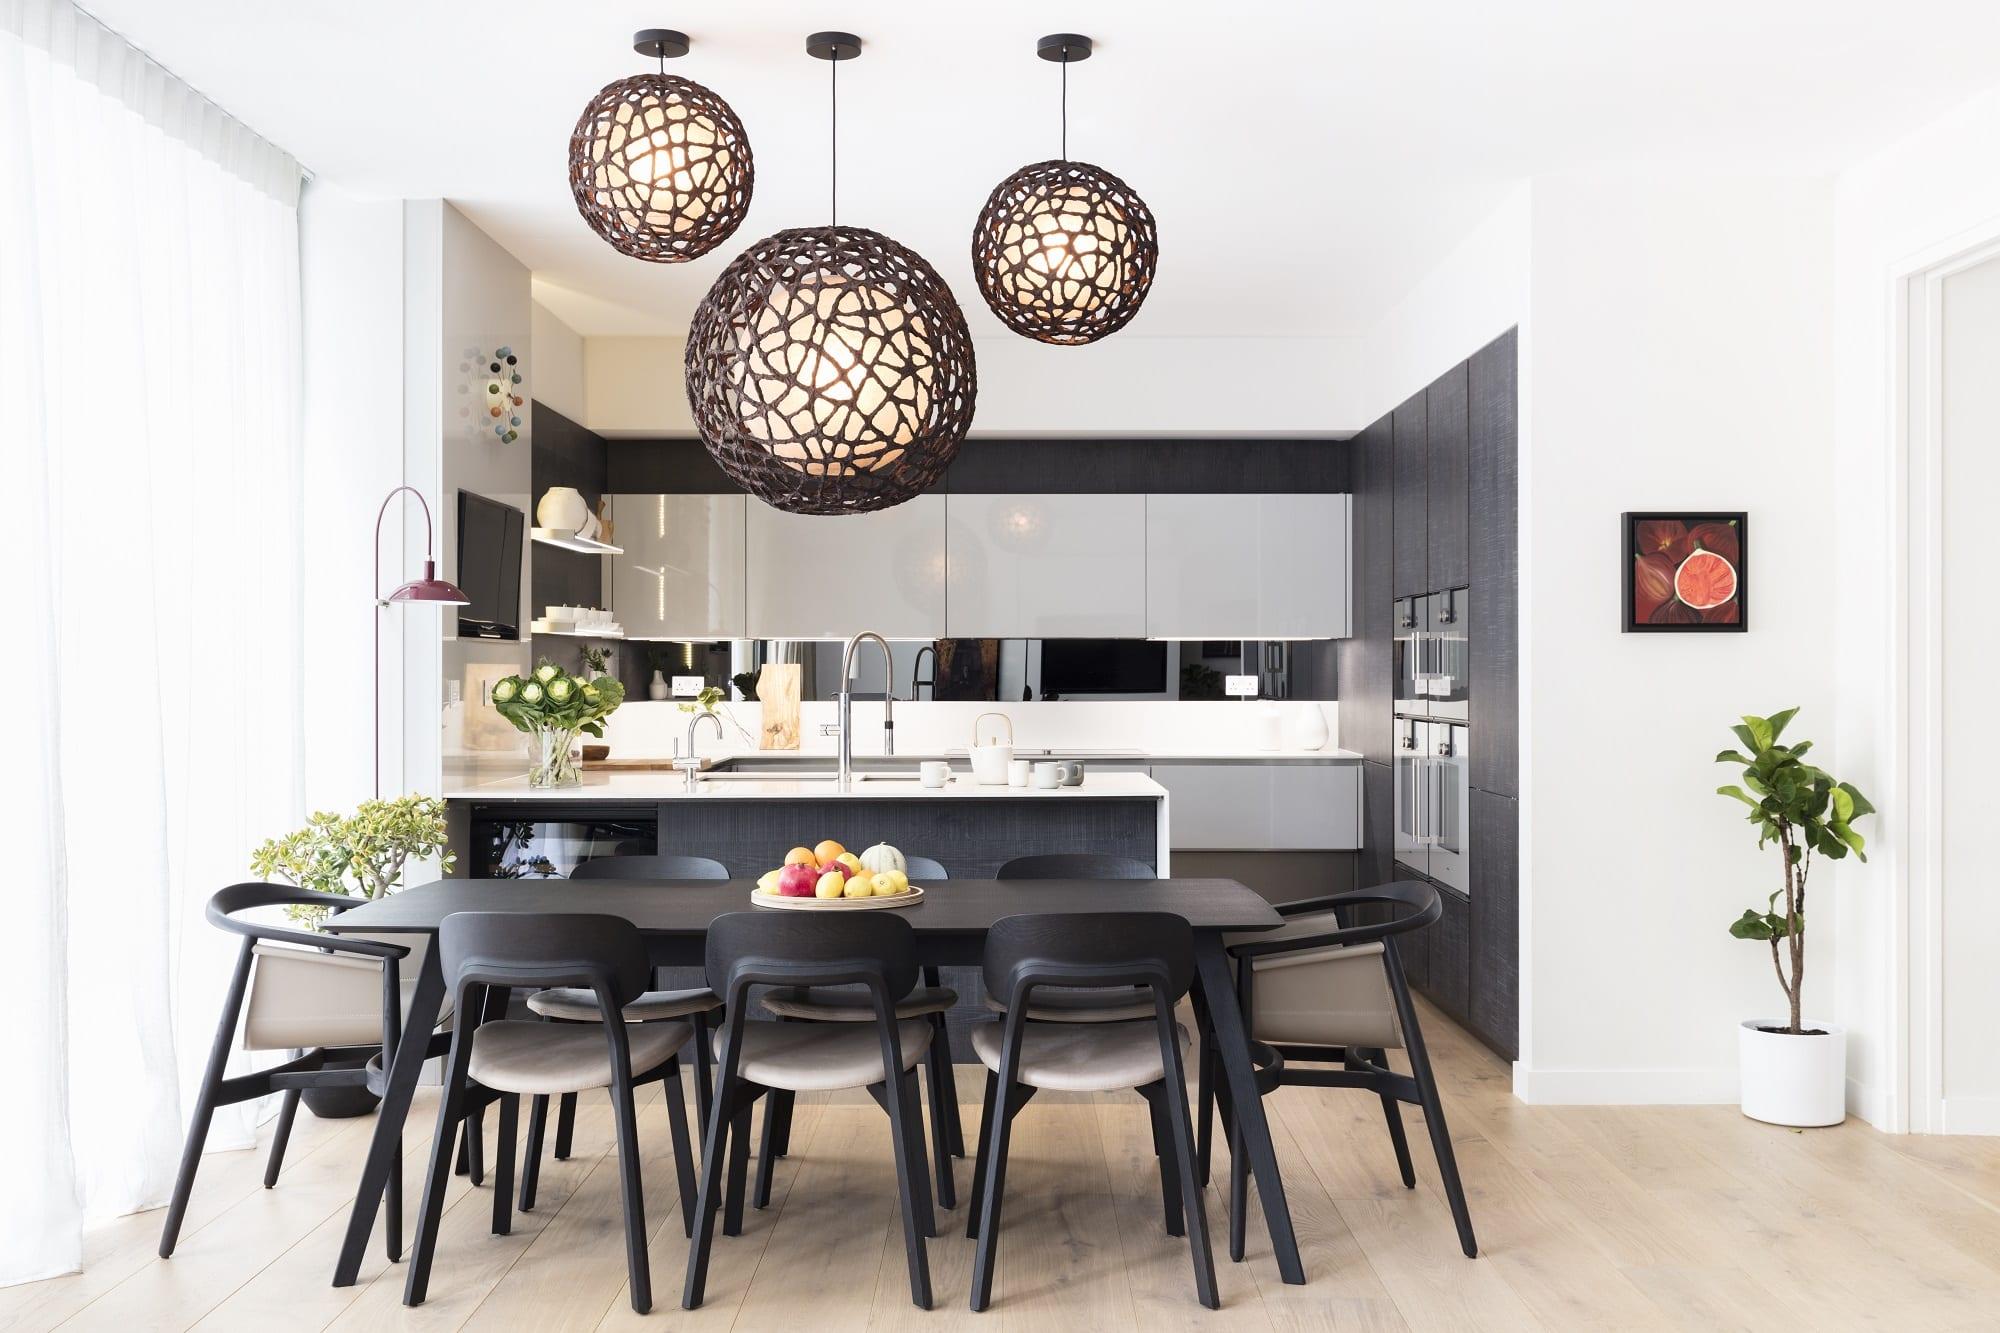 Black And Milk Dining Room Decor ideas